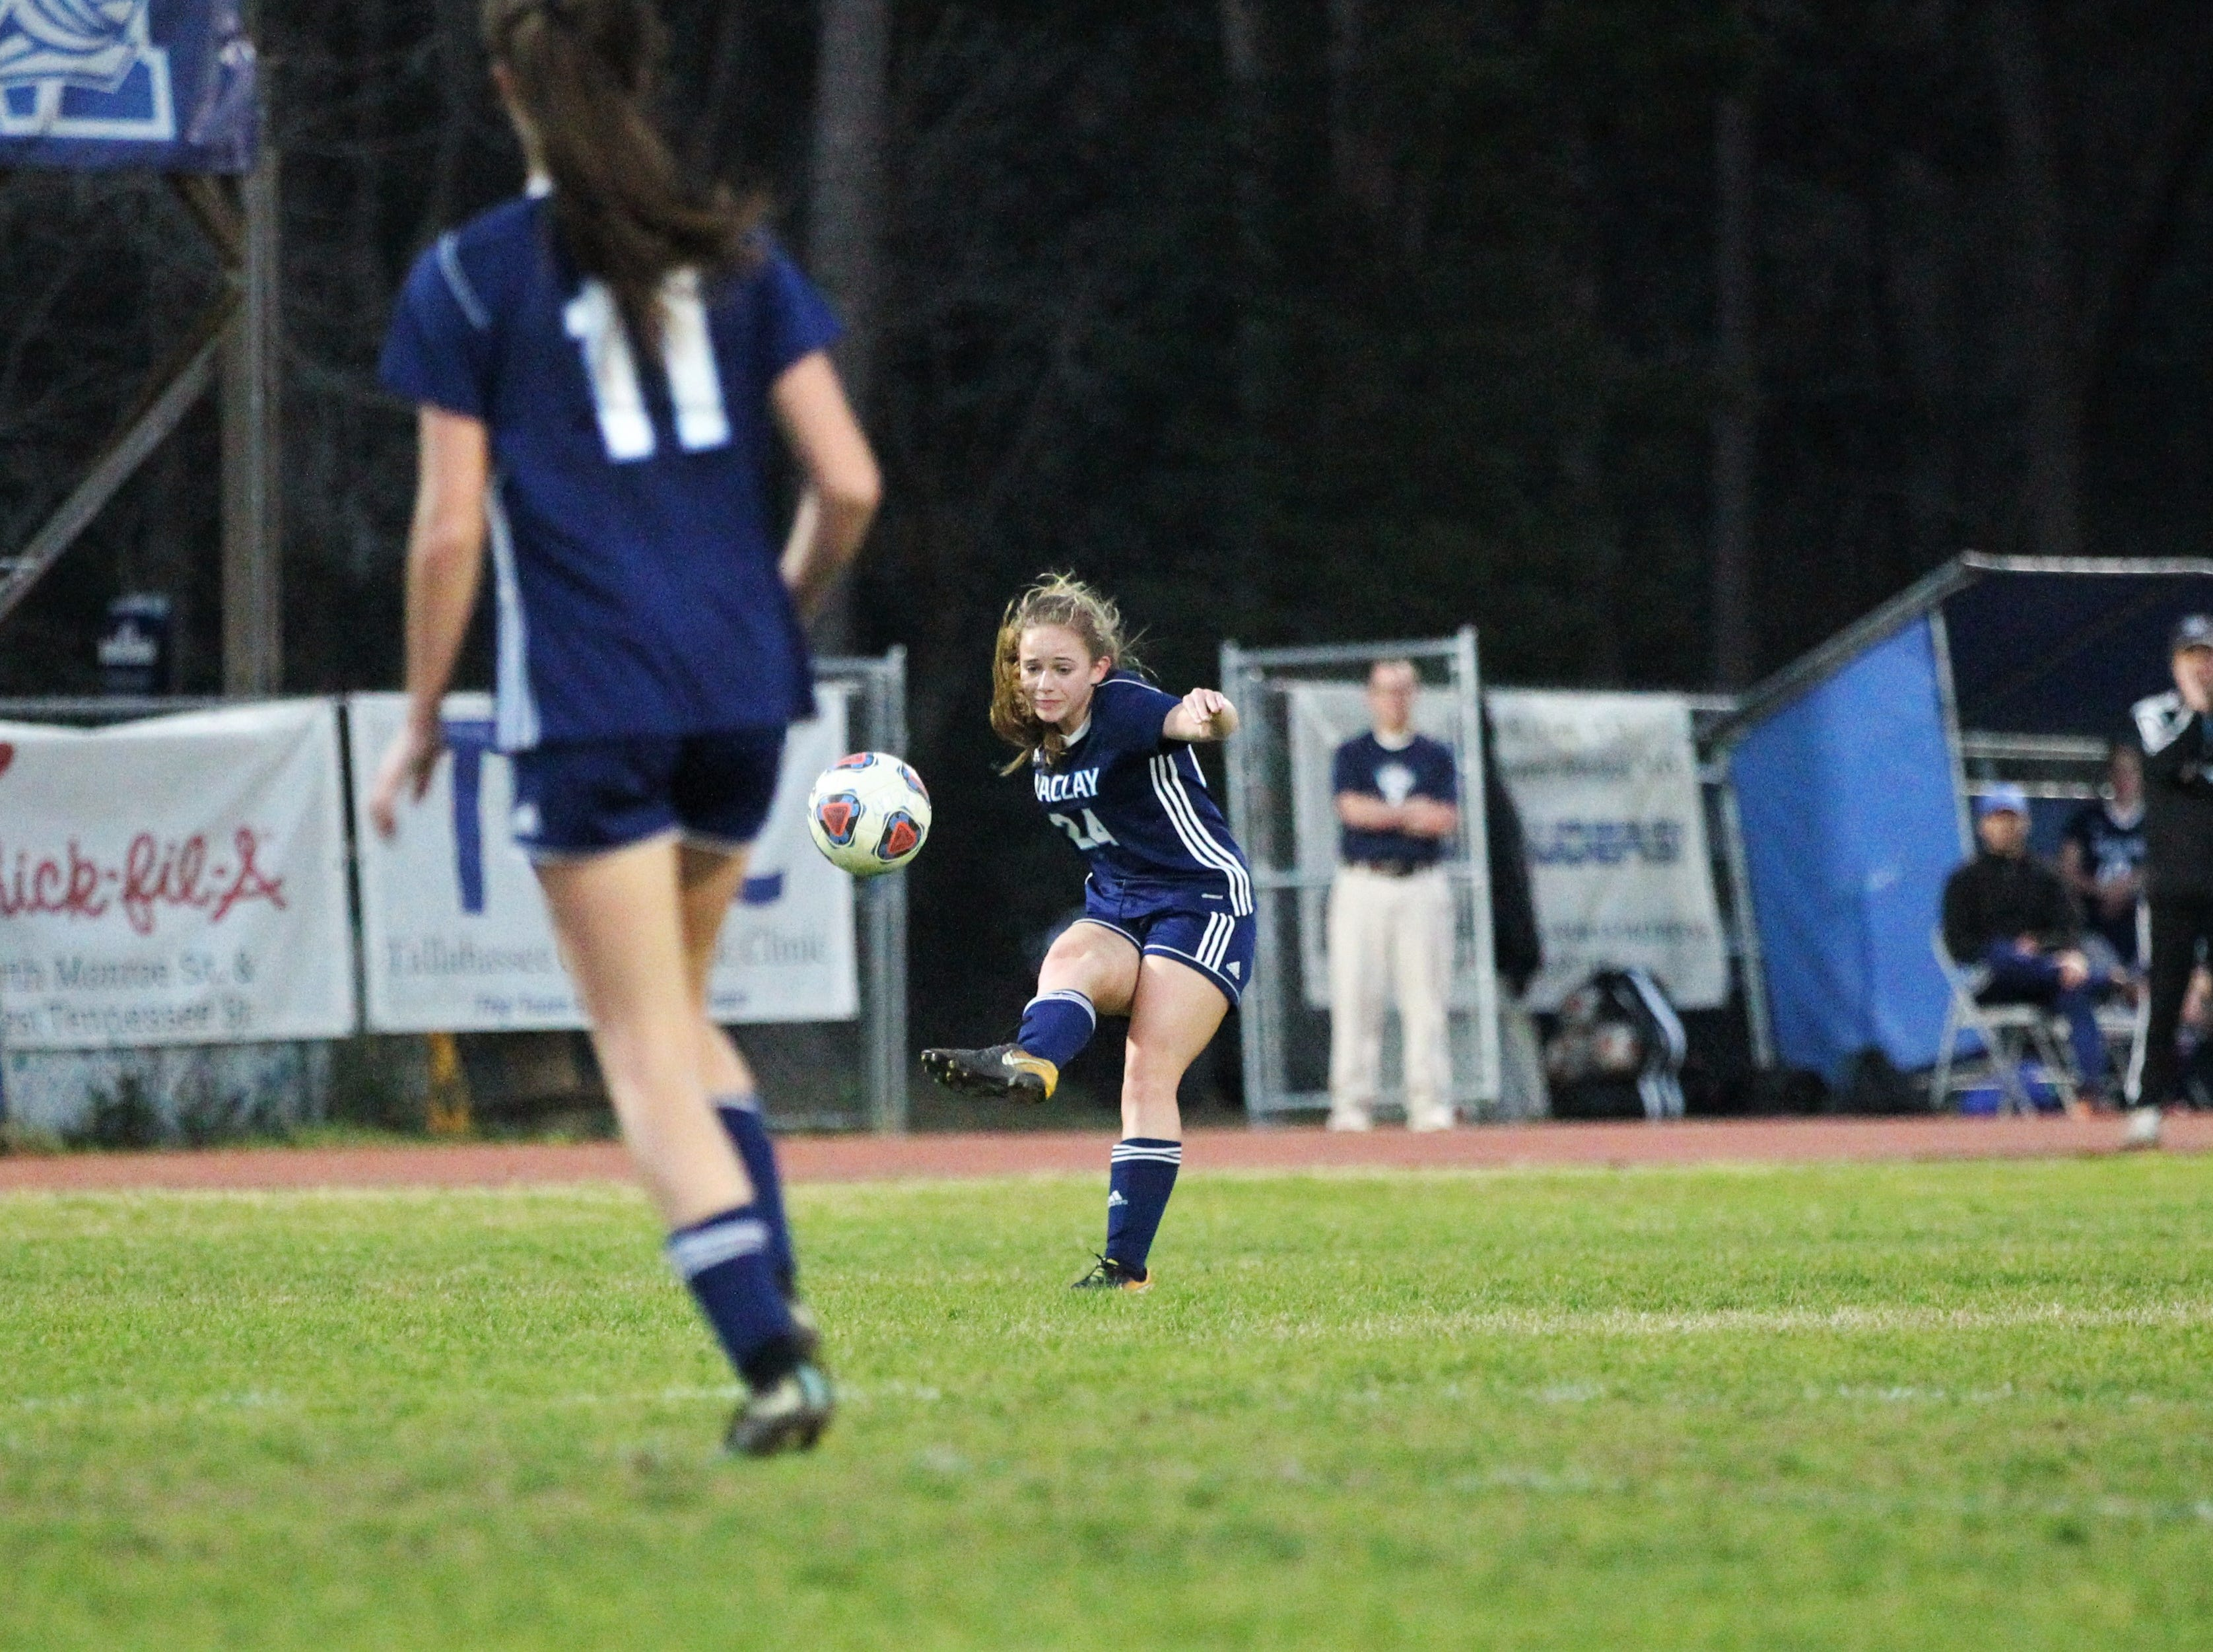 Maclay's Lauren Dessi passes upfield as Maclay's girls soccer team beat St. Joseph Academy 4-0 in a Region 1-1A quarterfinal on Jan. 5, 2019.